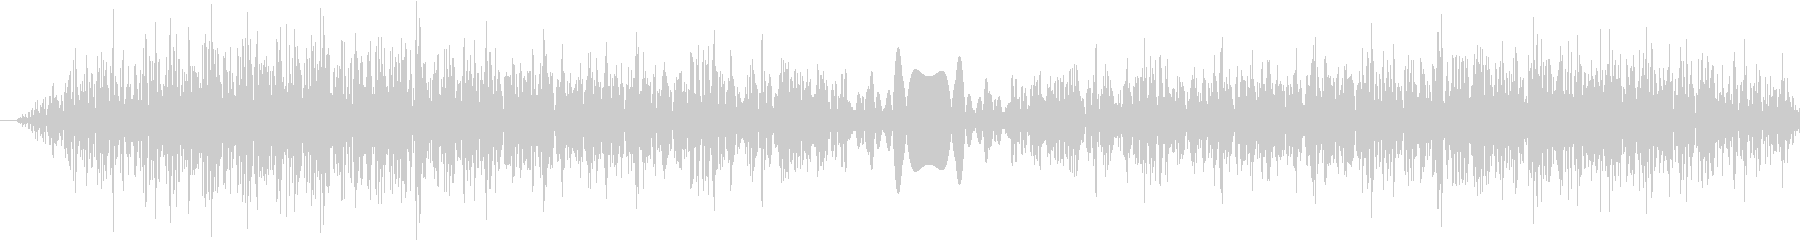 DJプレイ スクラッチ・ノイズ 1の未再生の波形